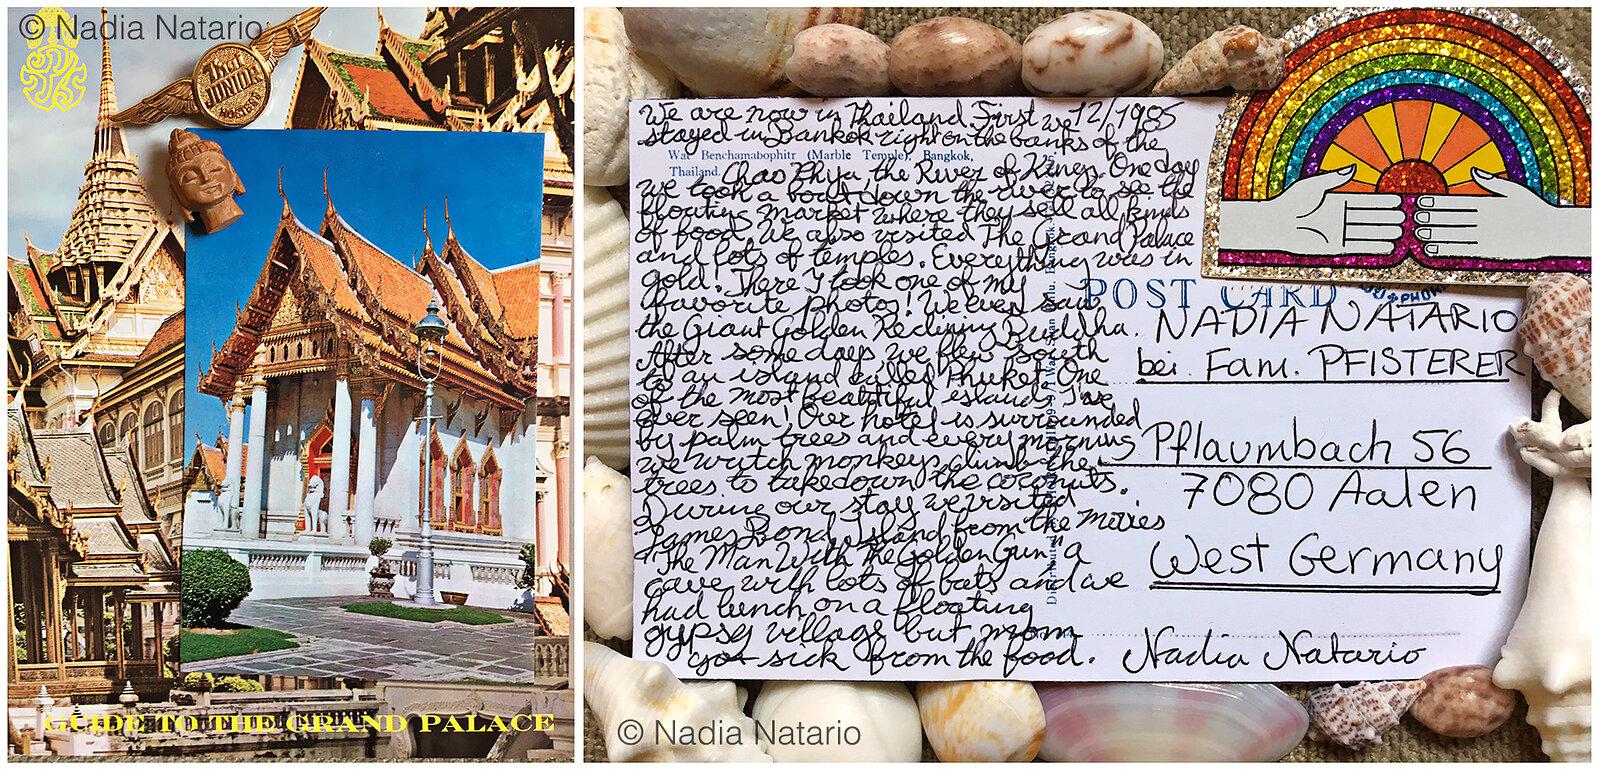 Postcards to Myself - Tailand, 1985